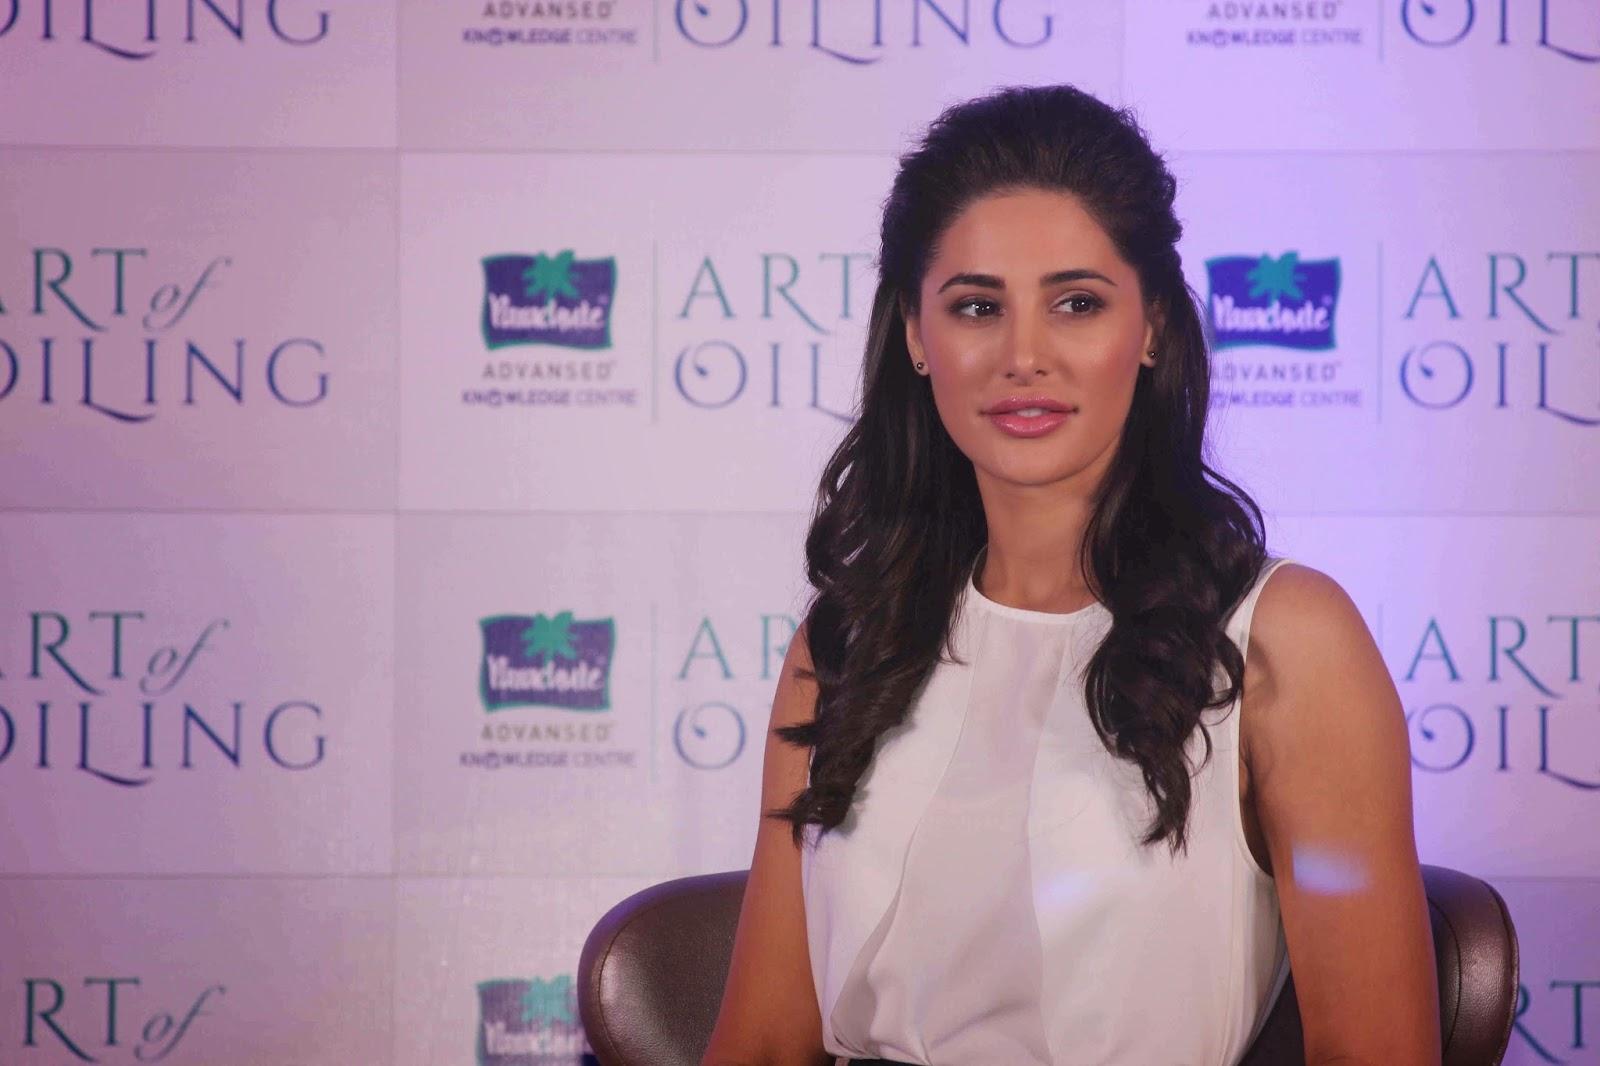 Nargis Fakhri Launch Parachute Signature Line Art Of Oiling